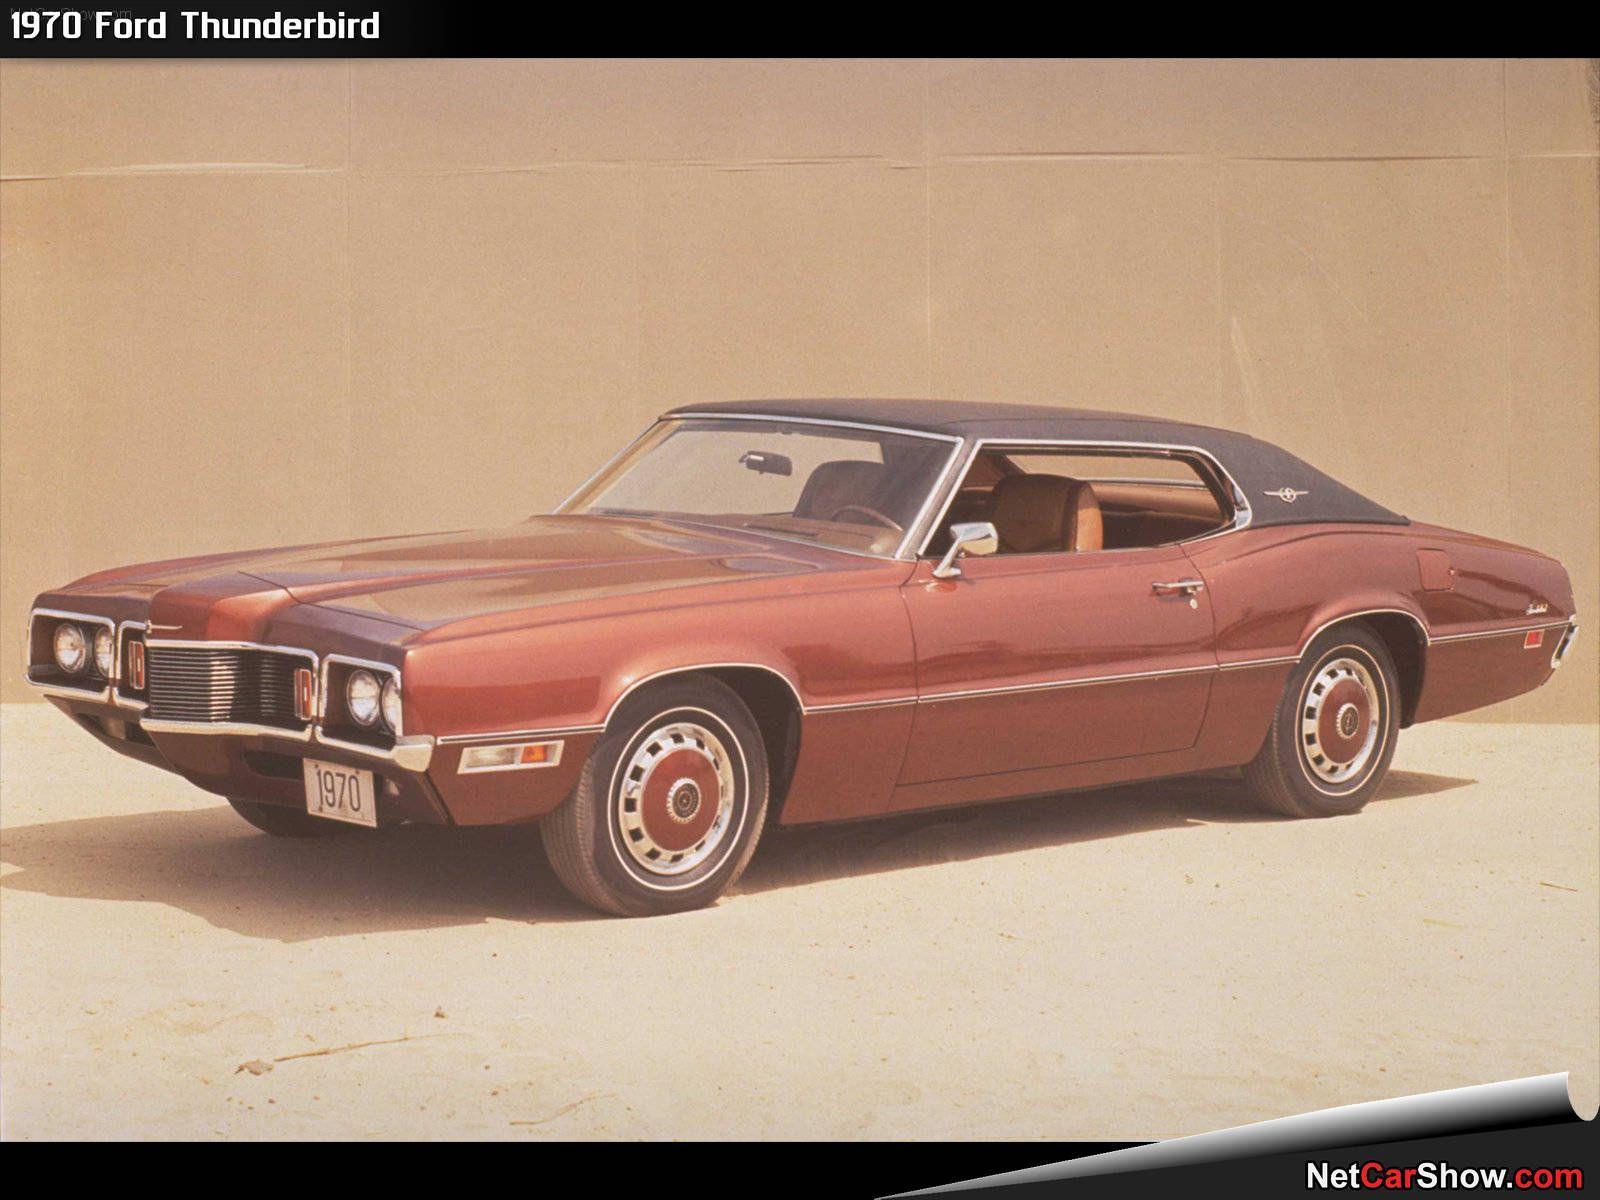 Ford Thunderbird 1970 サンダーバード, アメ車, 車